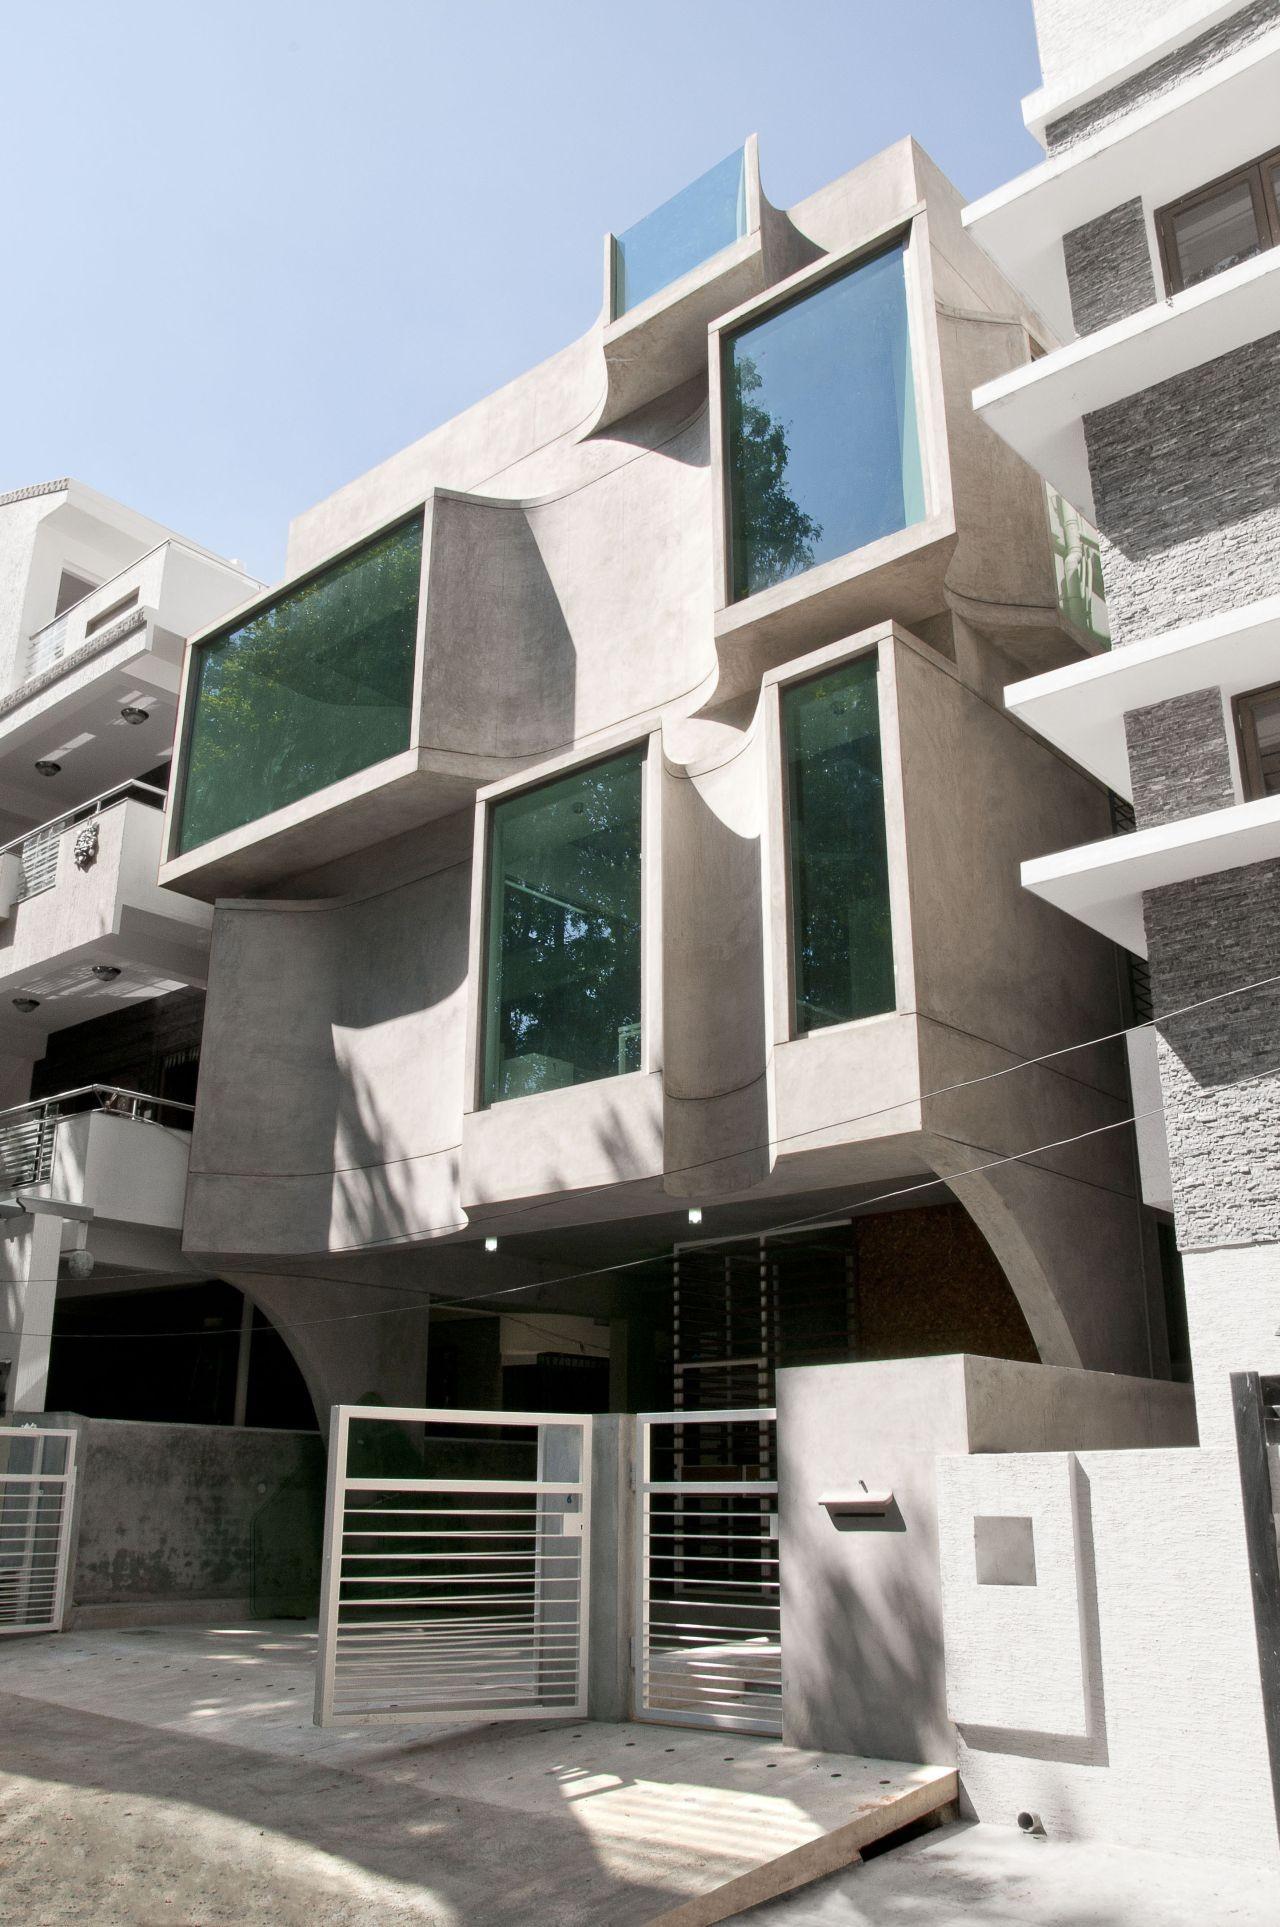 Top 50 Architecture Firms in Bangalore - Sujit Nair Design Group (SDeG)